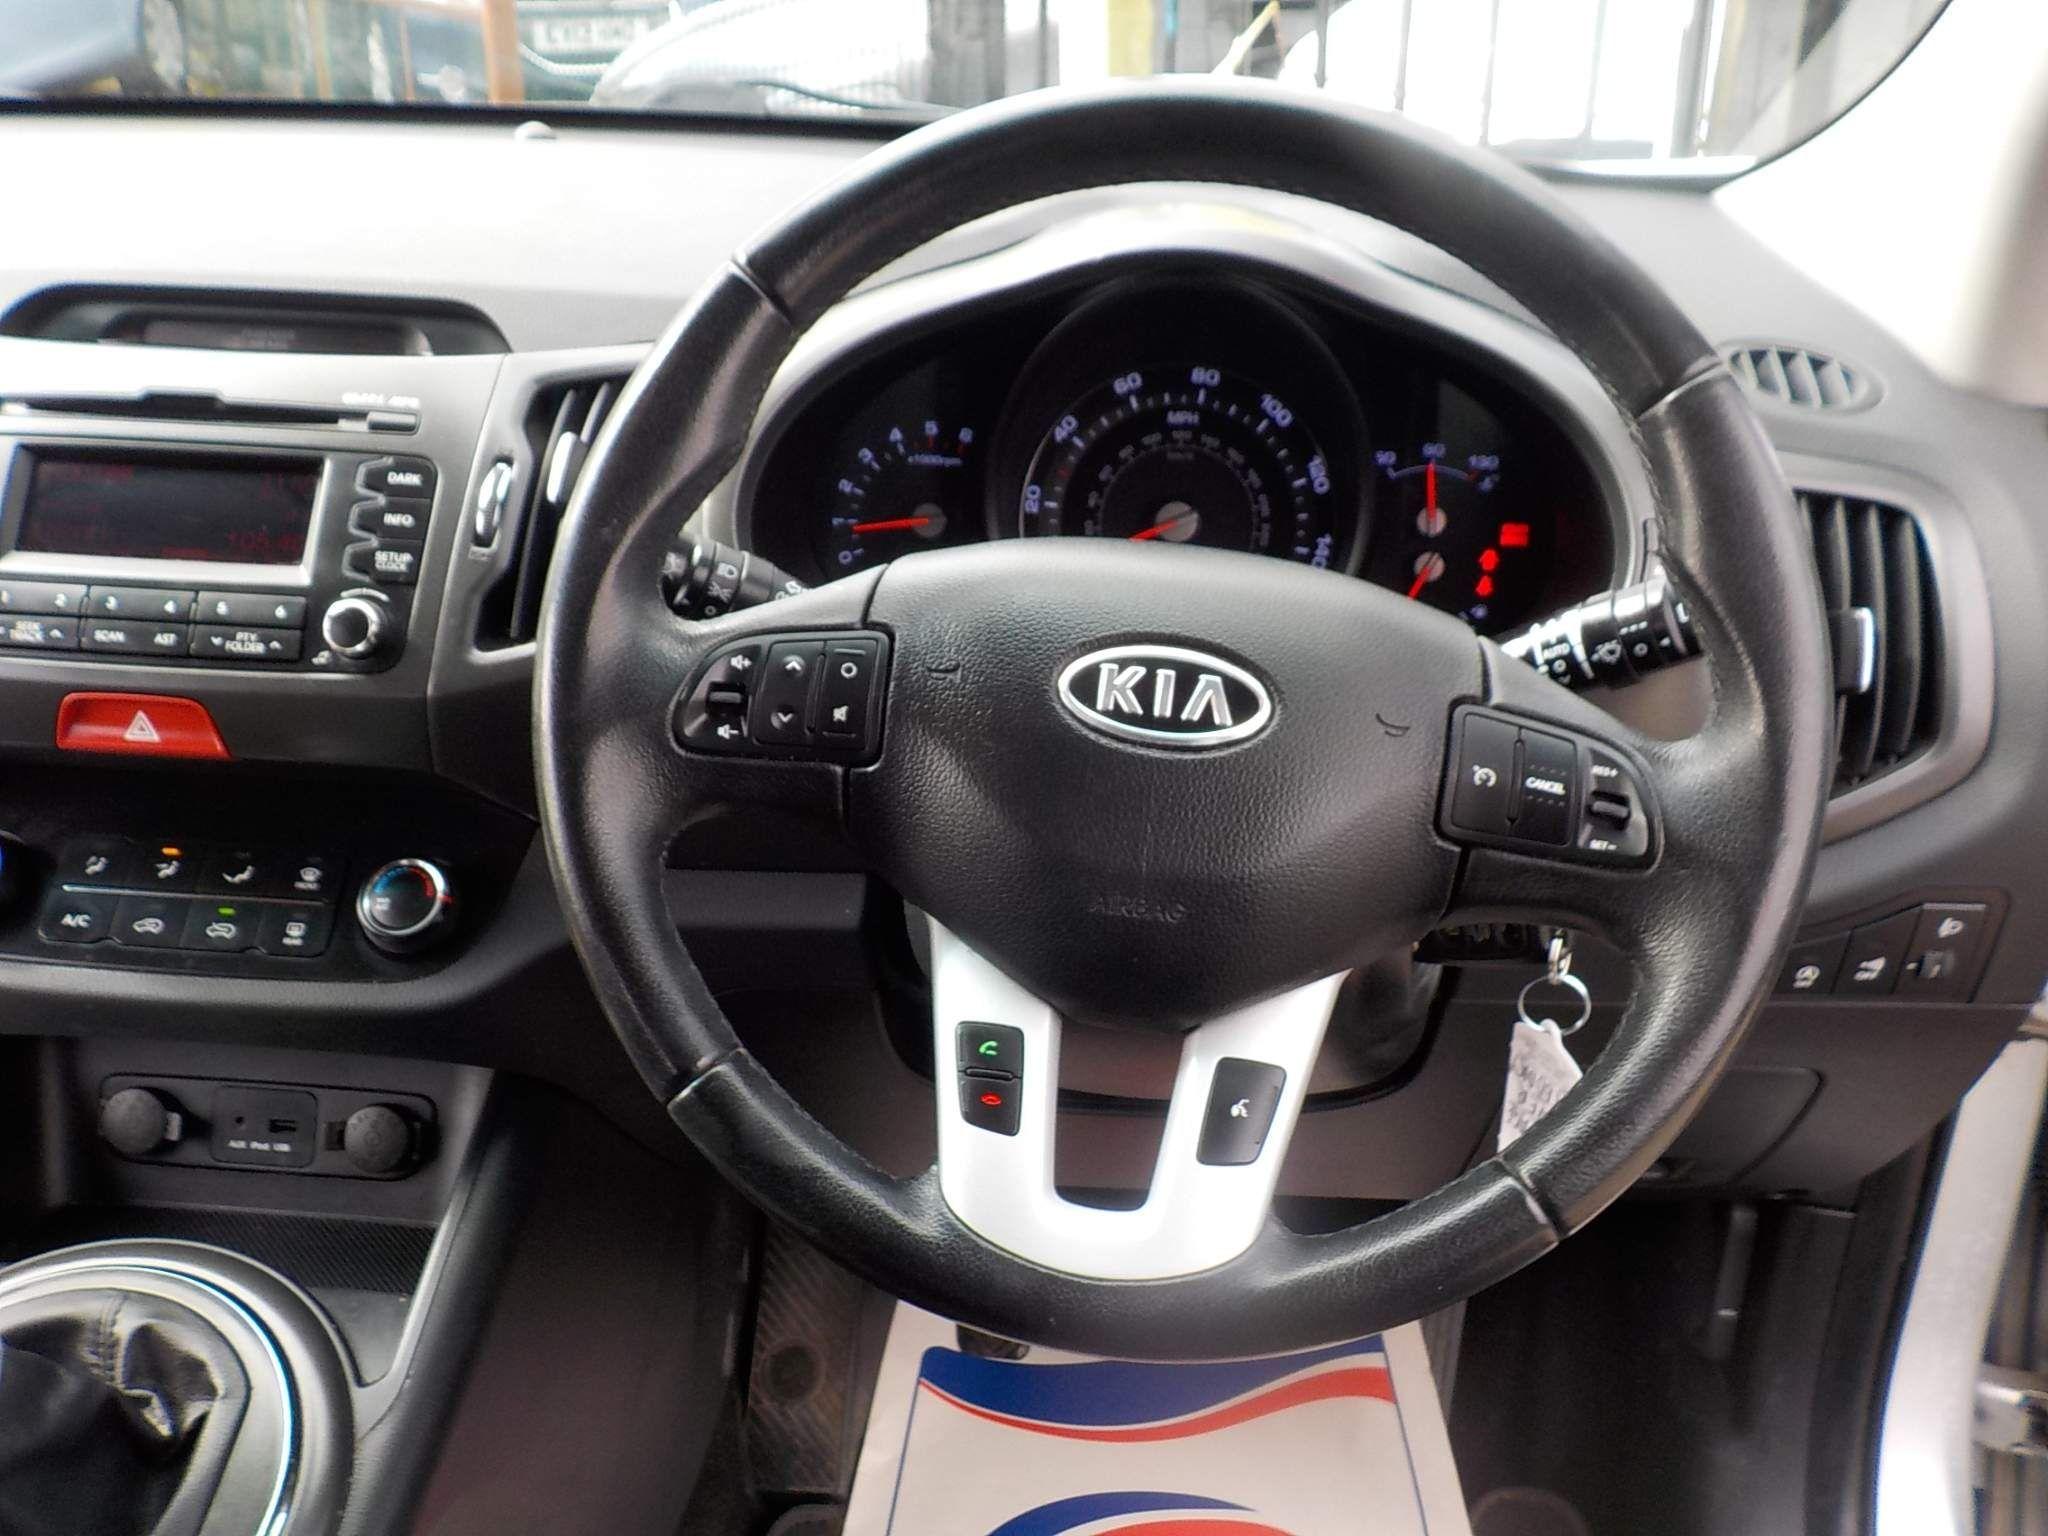 Kia Sportage 1.7 CRDi 1 2WD 5dr